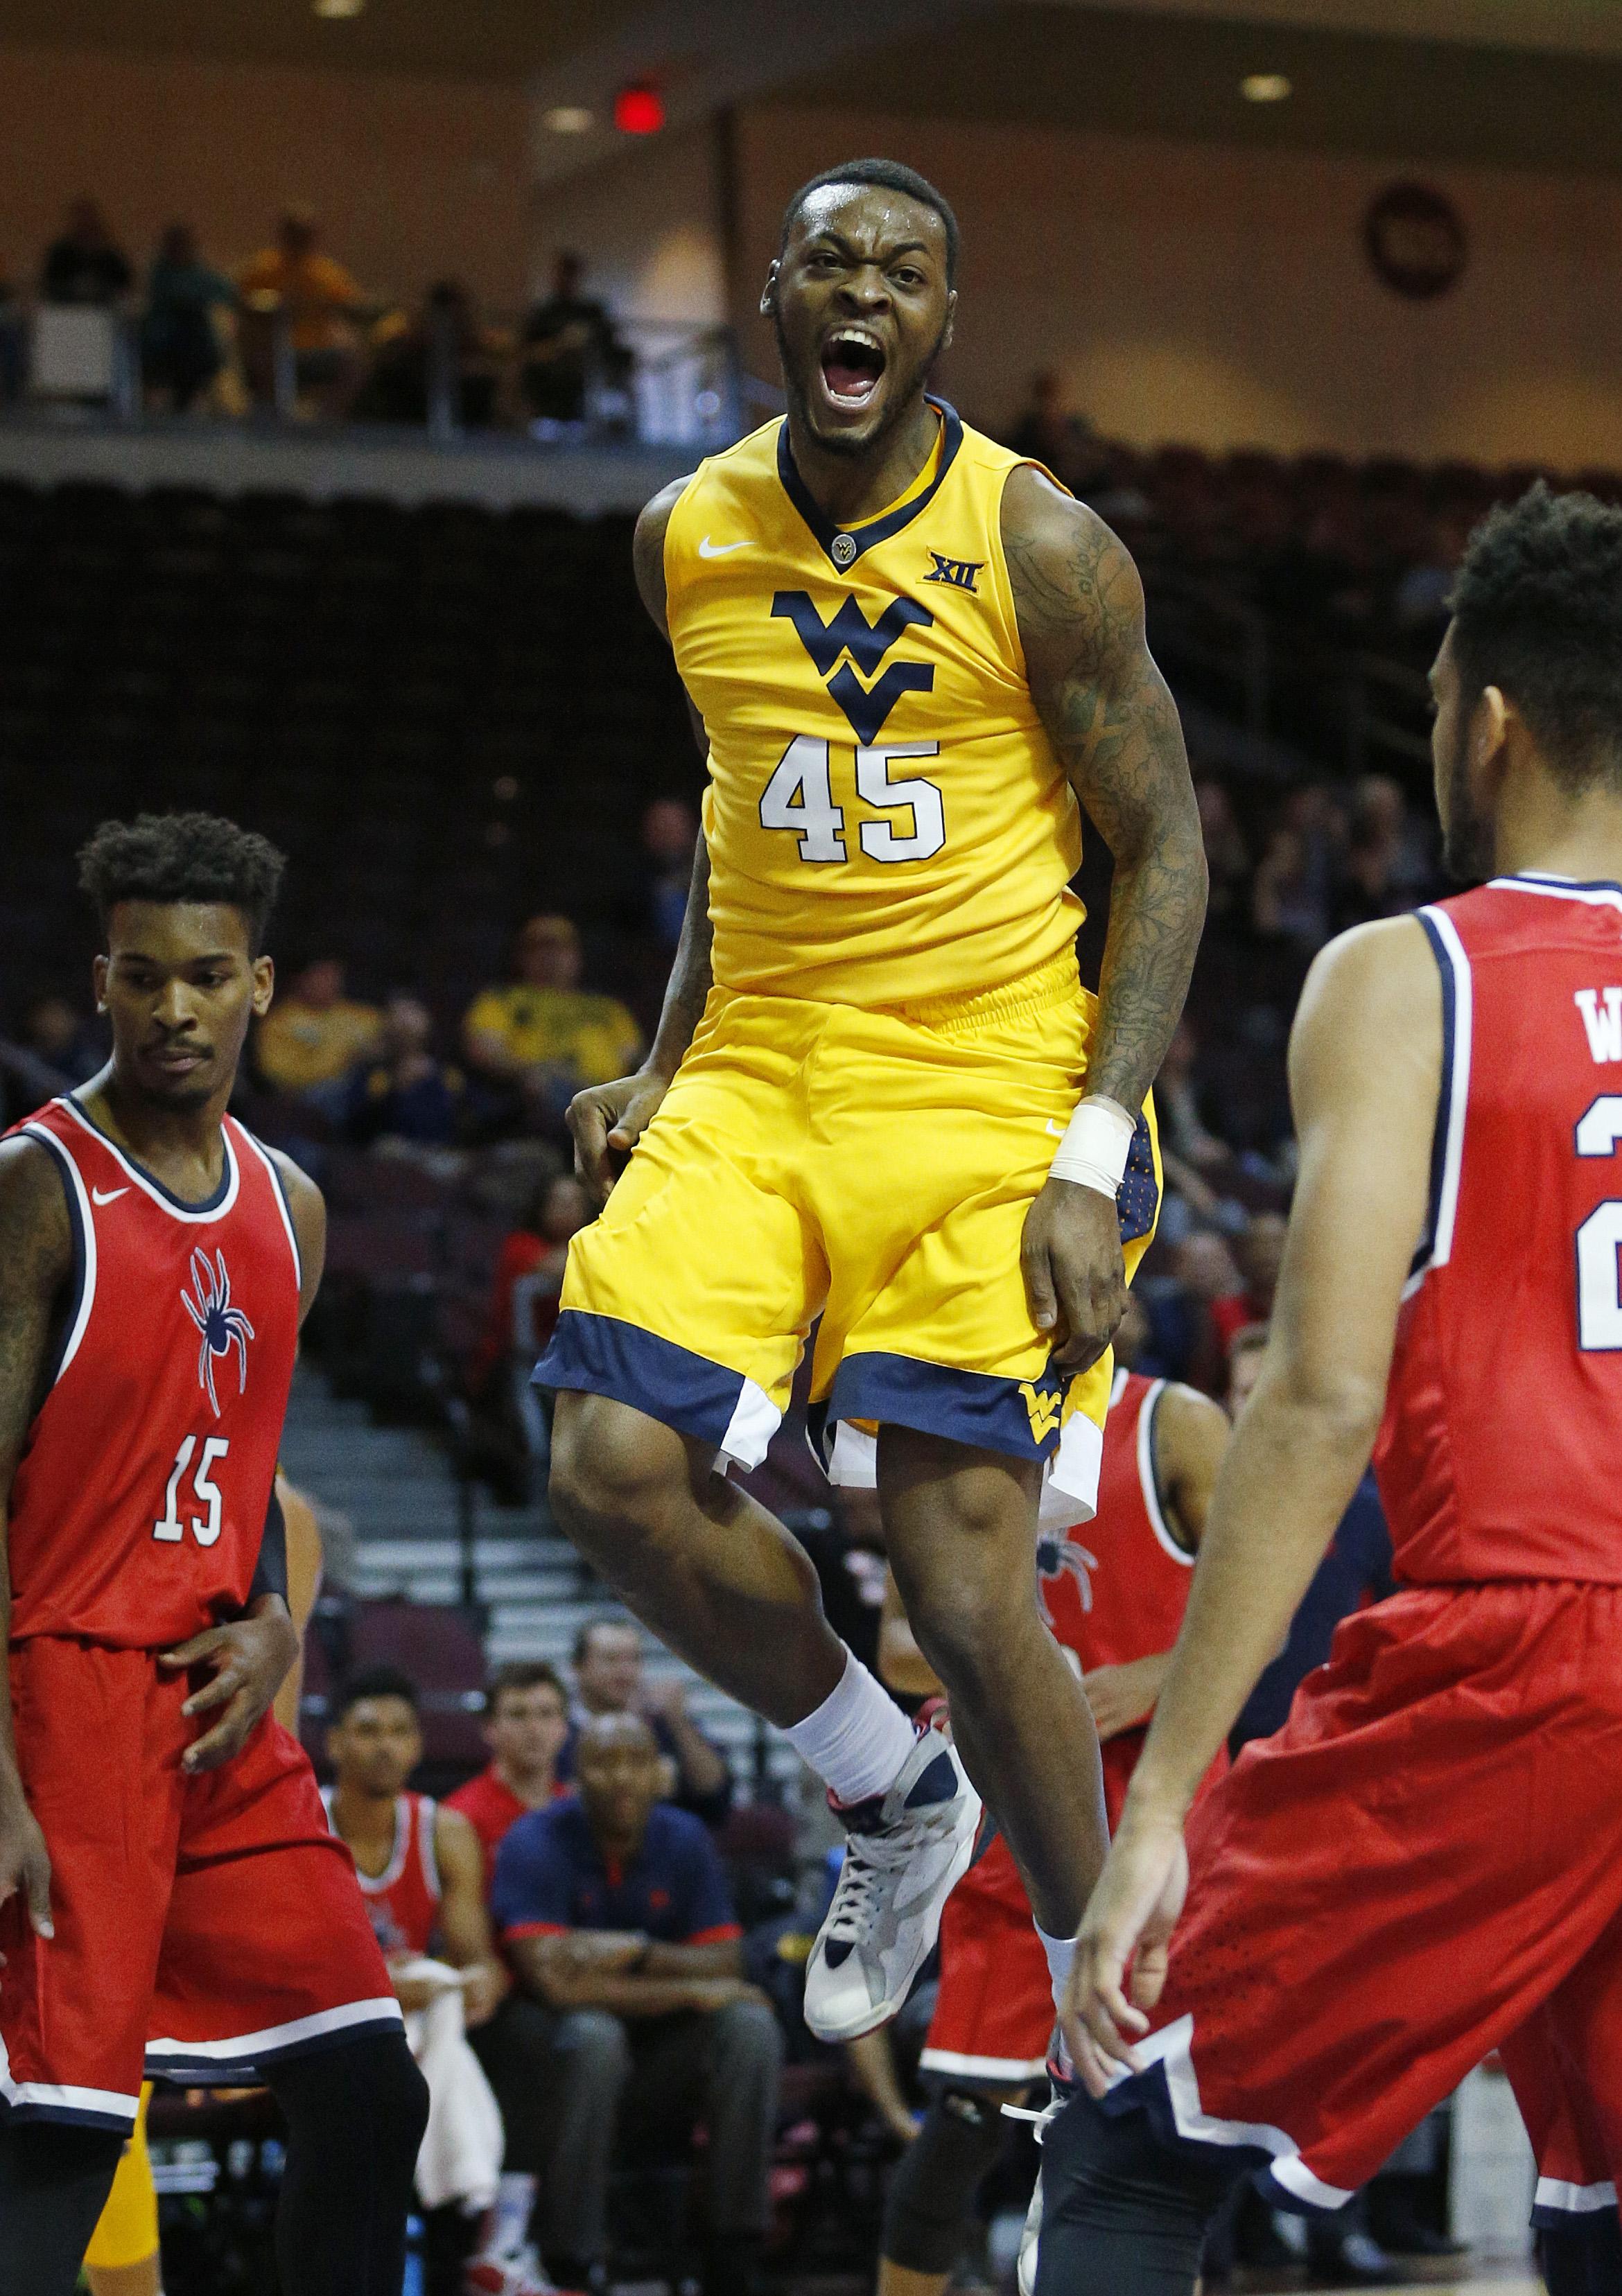 West Virginia forward Elijah Macon celebrates after scoring against Richmond during the first half of an NCAA college basketball game Thursday, Nov. 26, 2015, in Las Vegas. (AP Photo/John Locher)